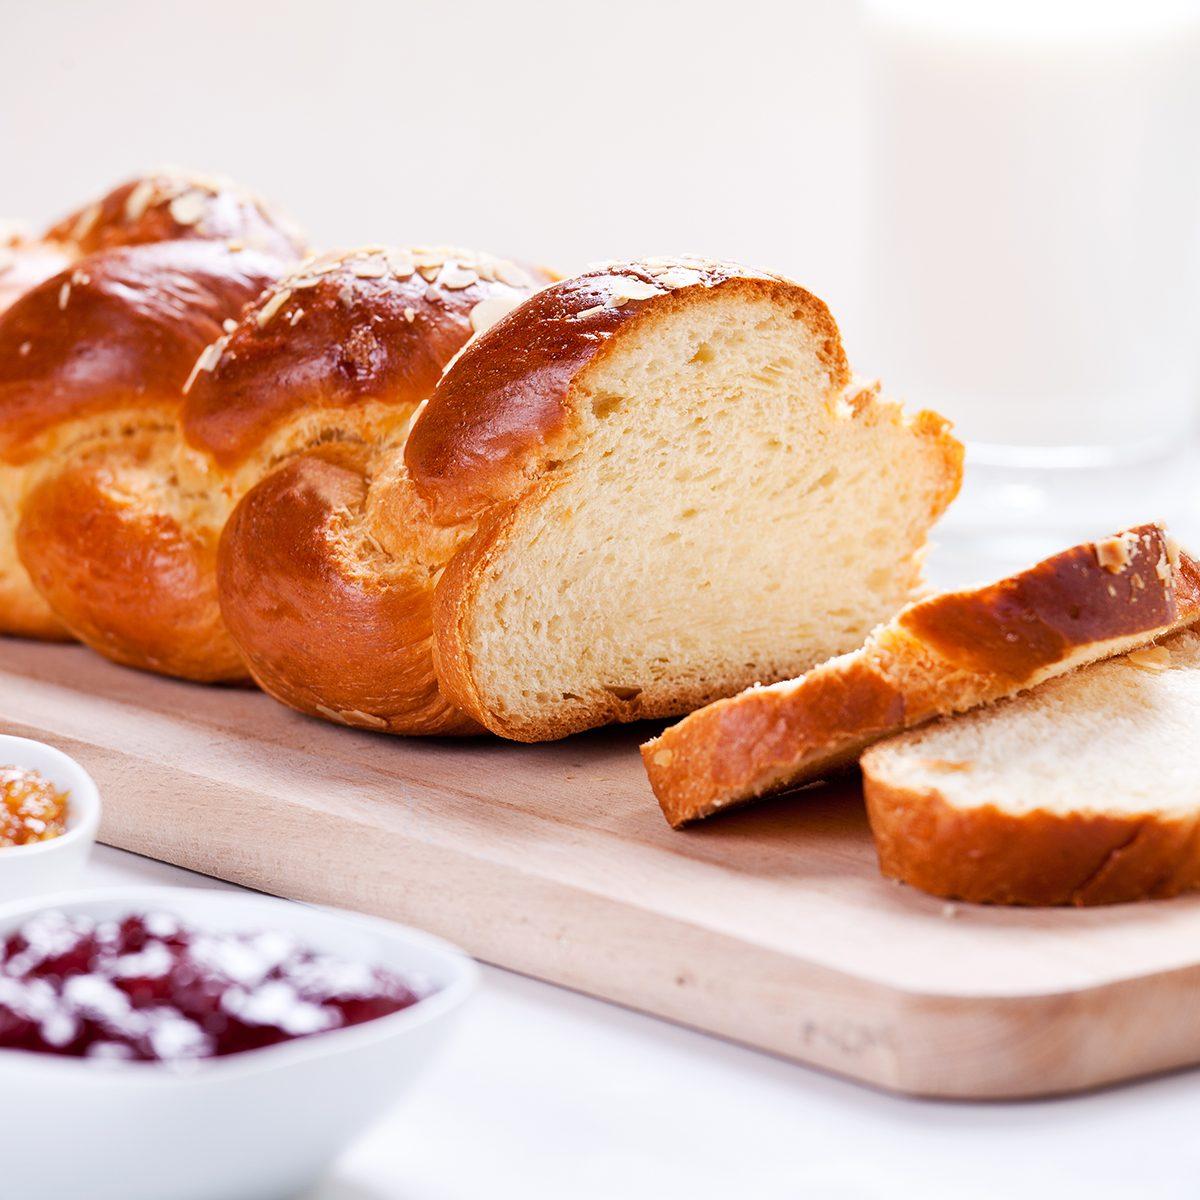 Homemade Traditonal Greek Brioche With Marmalade